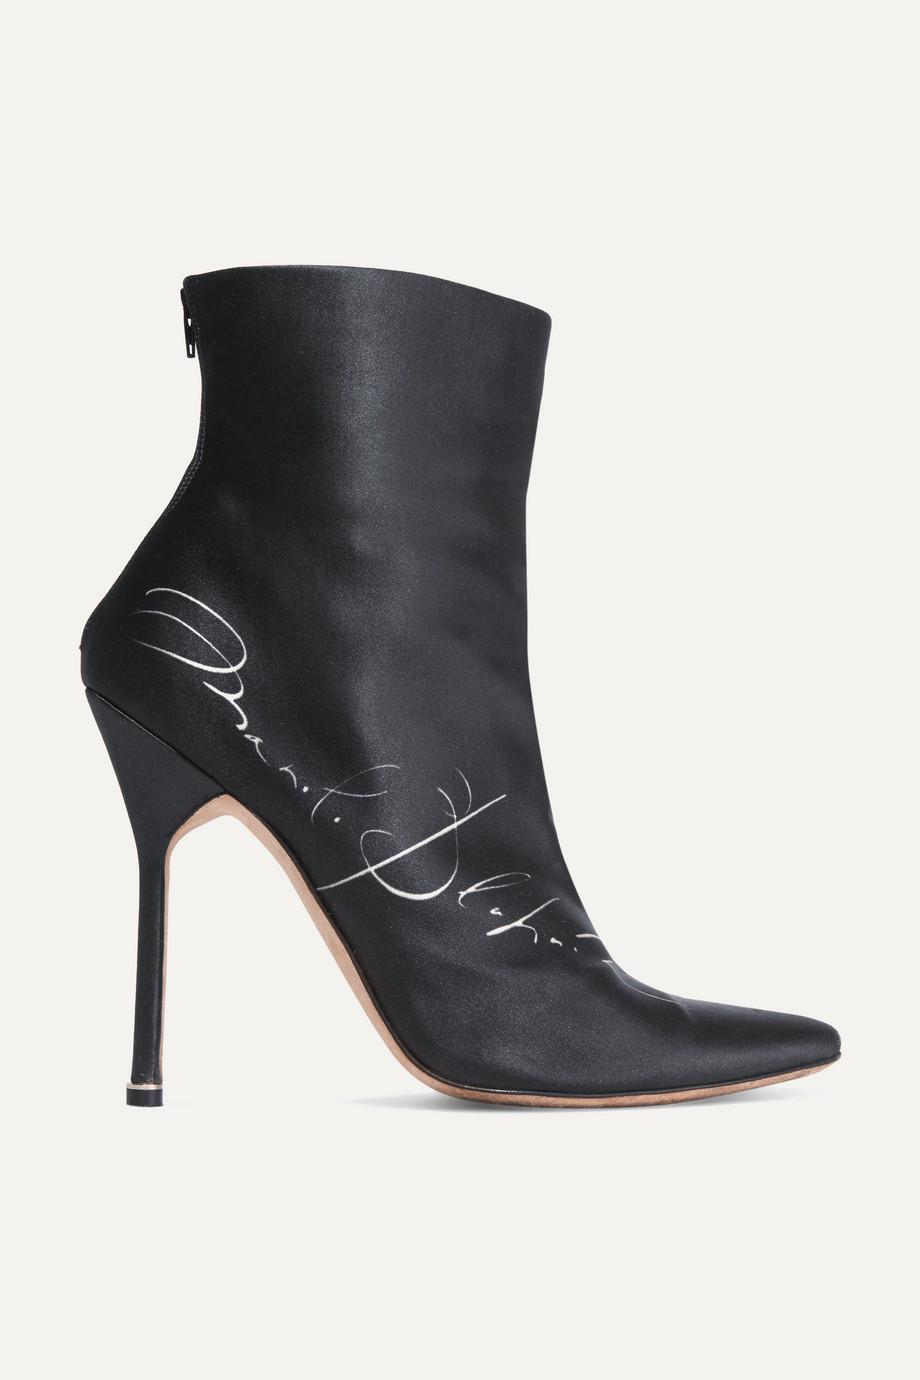 Vetements + Manolo Blahnik printed satin ankle boots